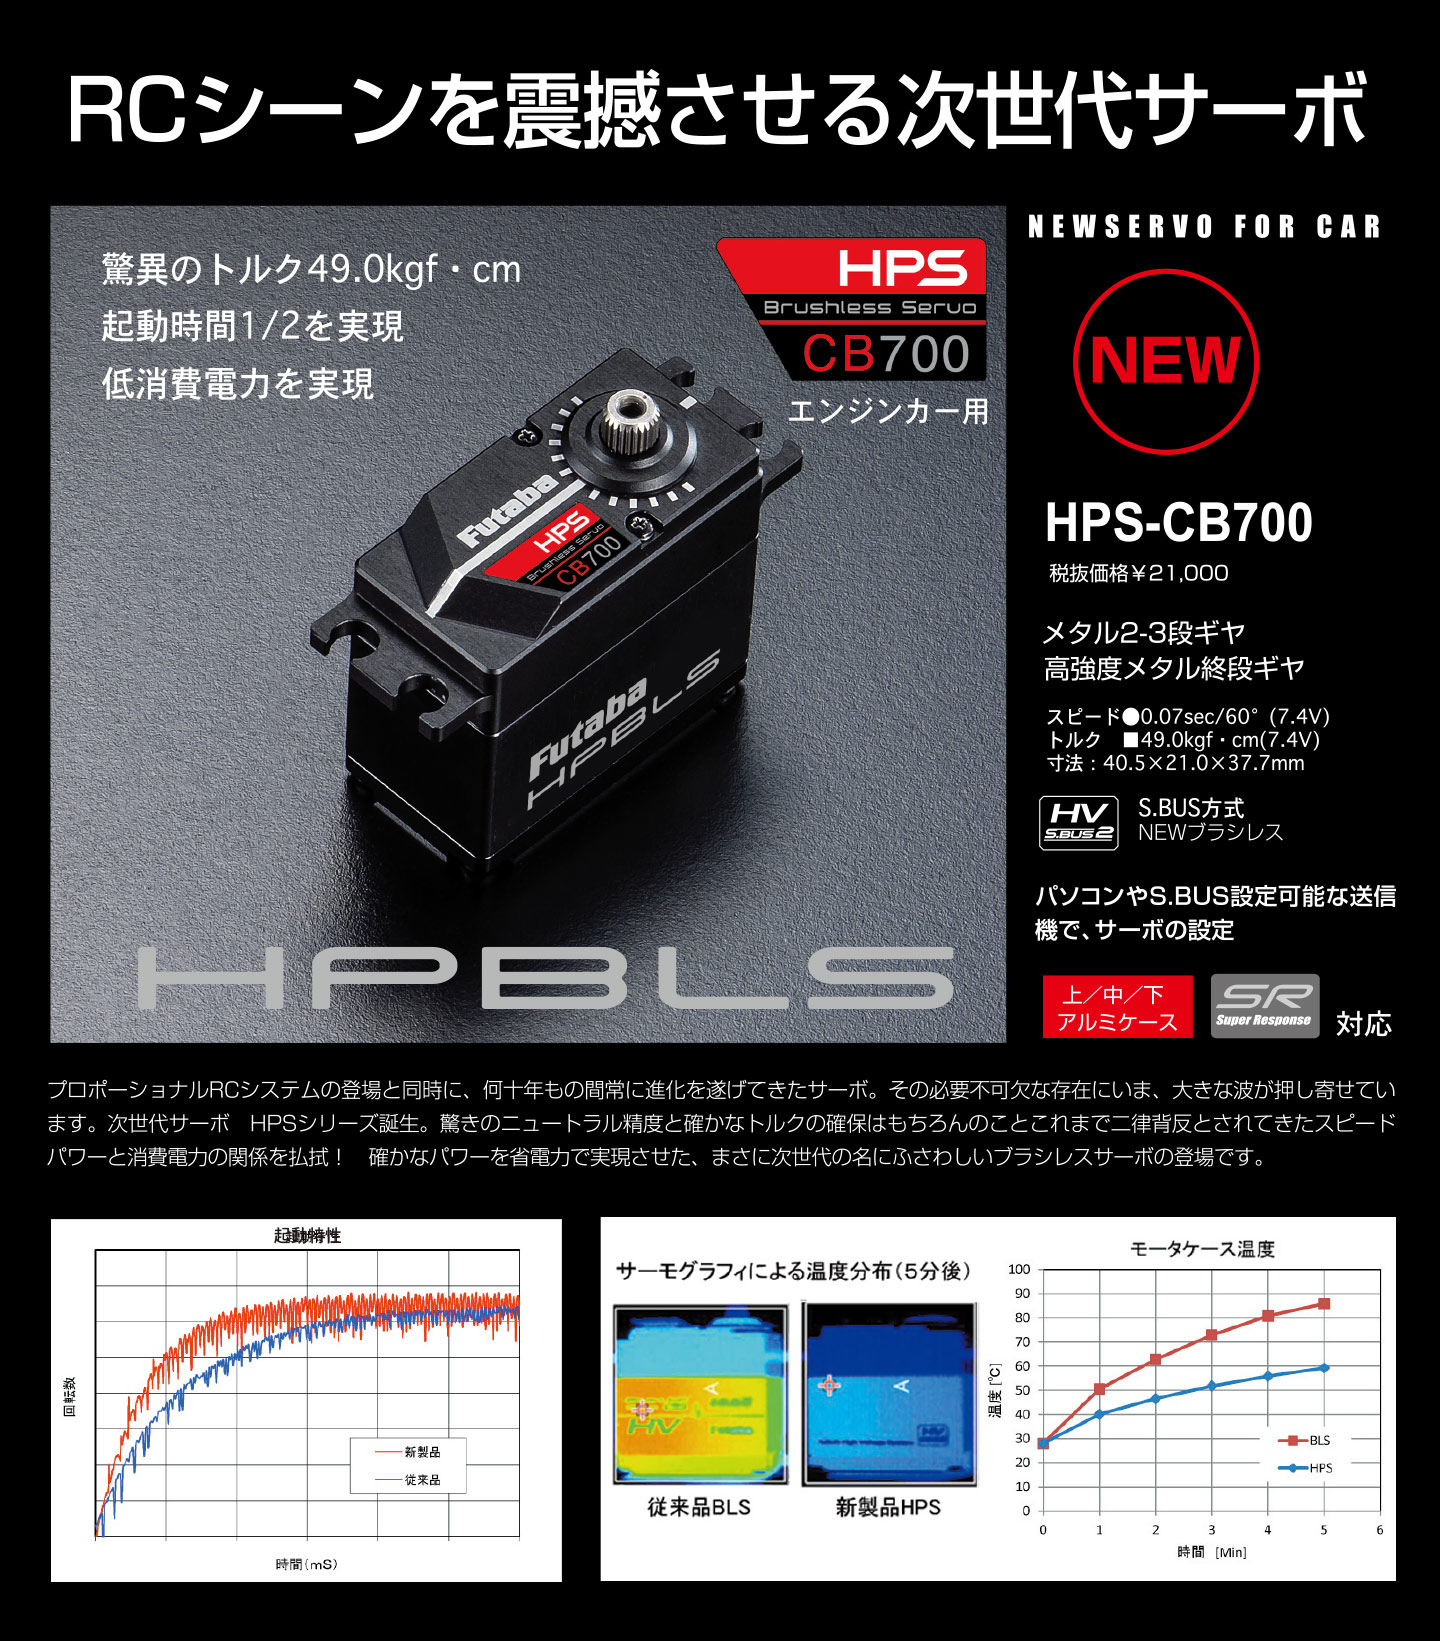 http://store.pro-s-futaba.co.jp/images/cb700.jpg